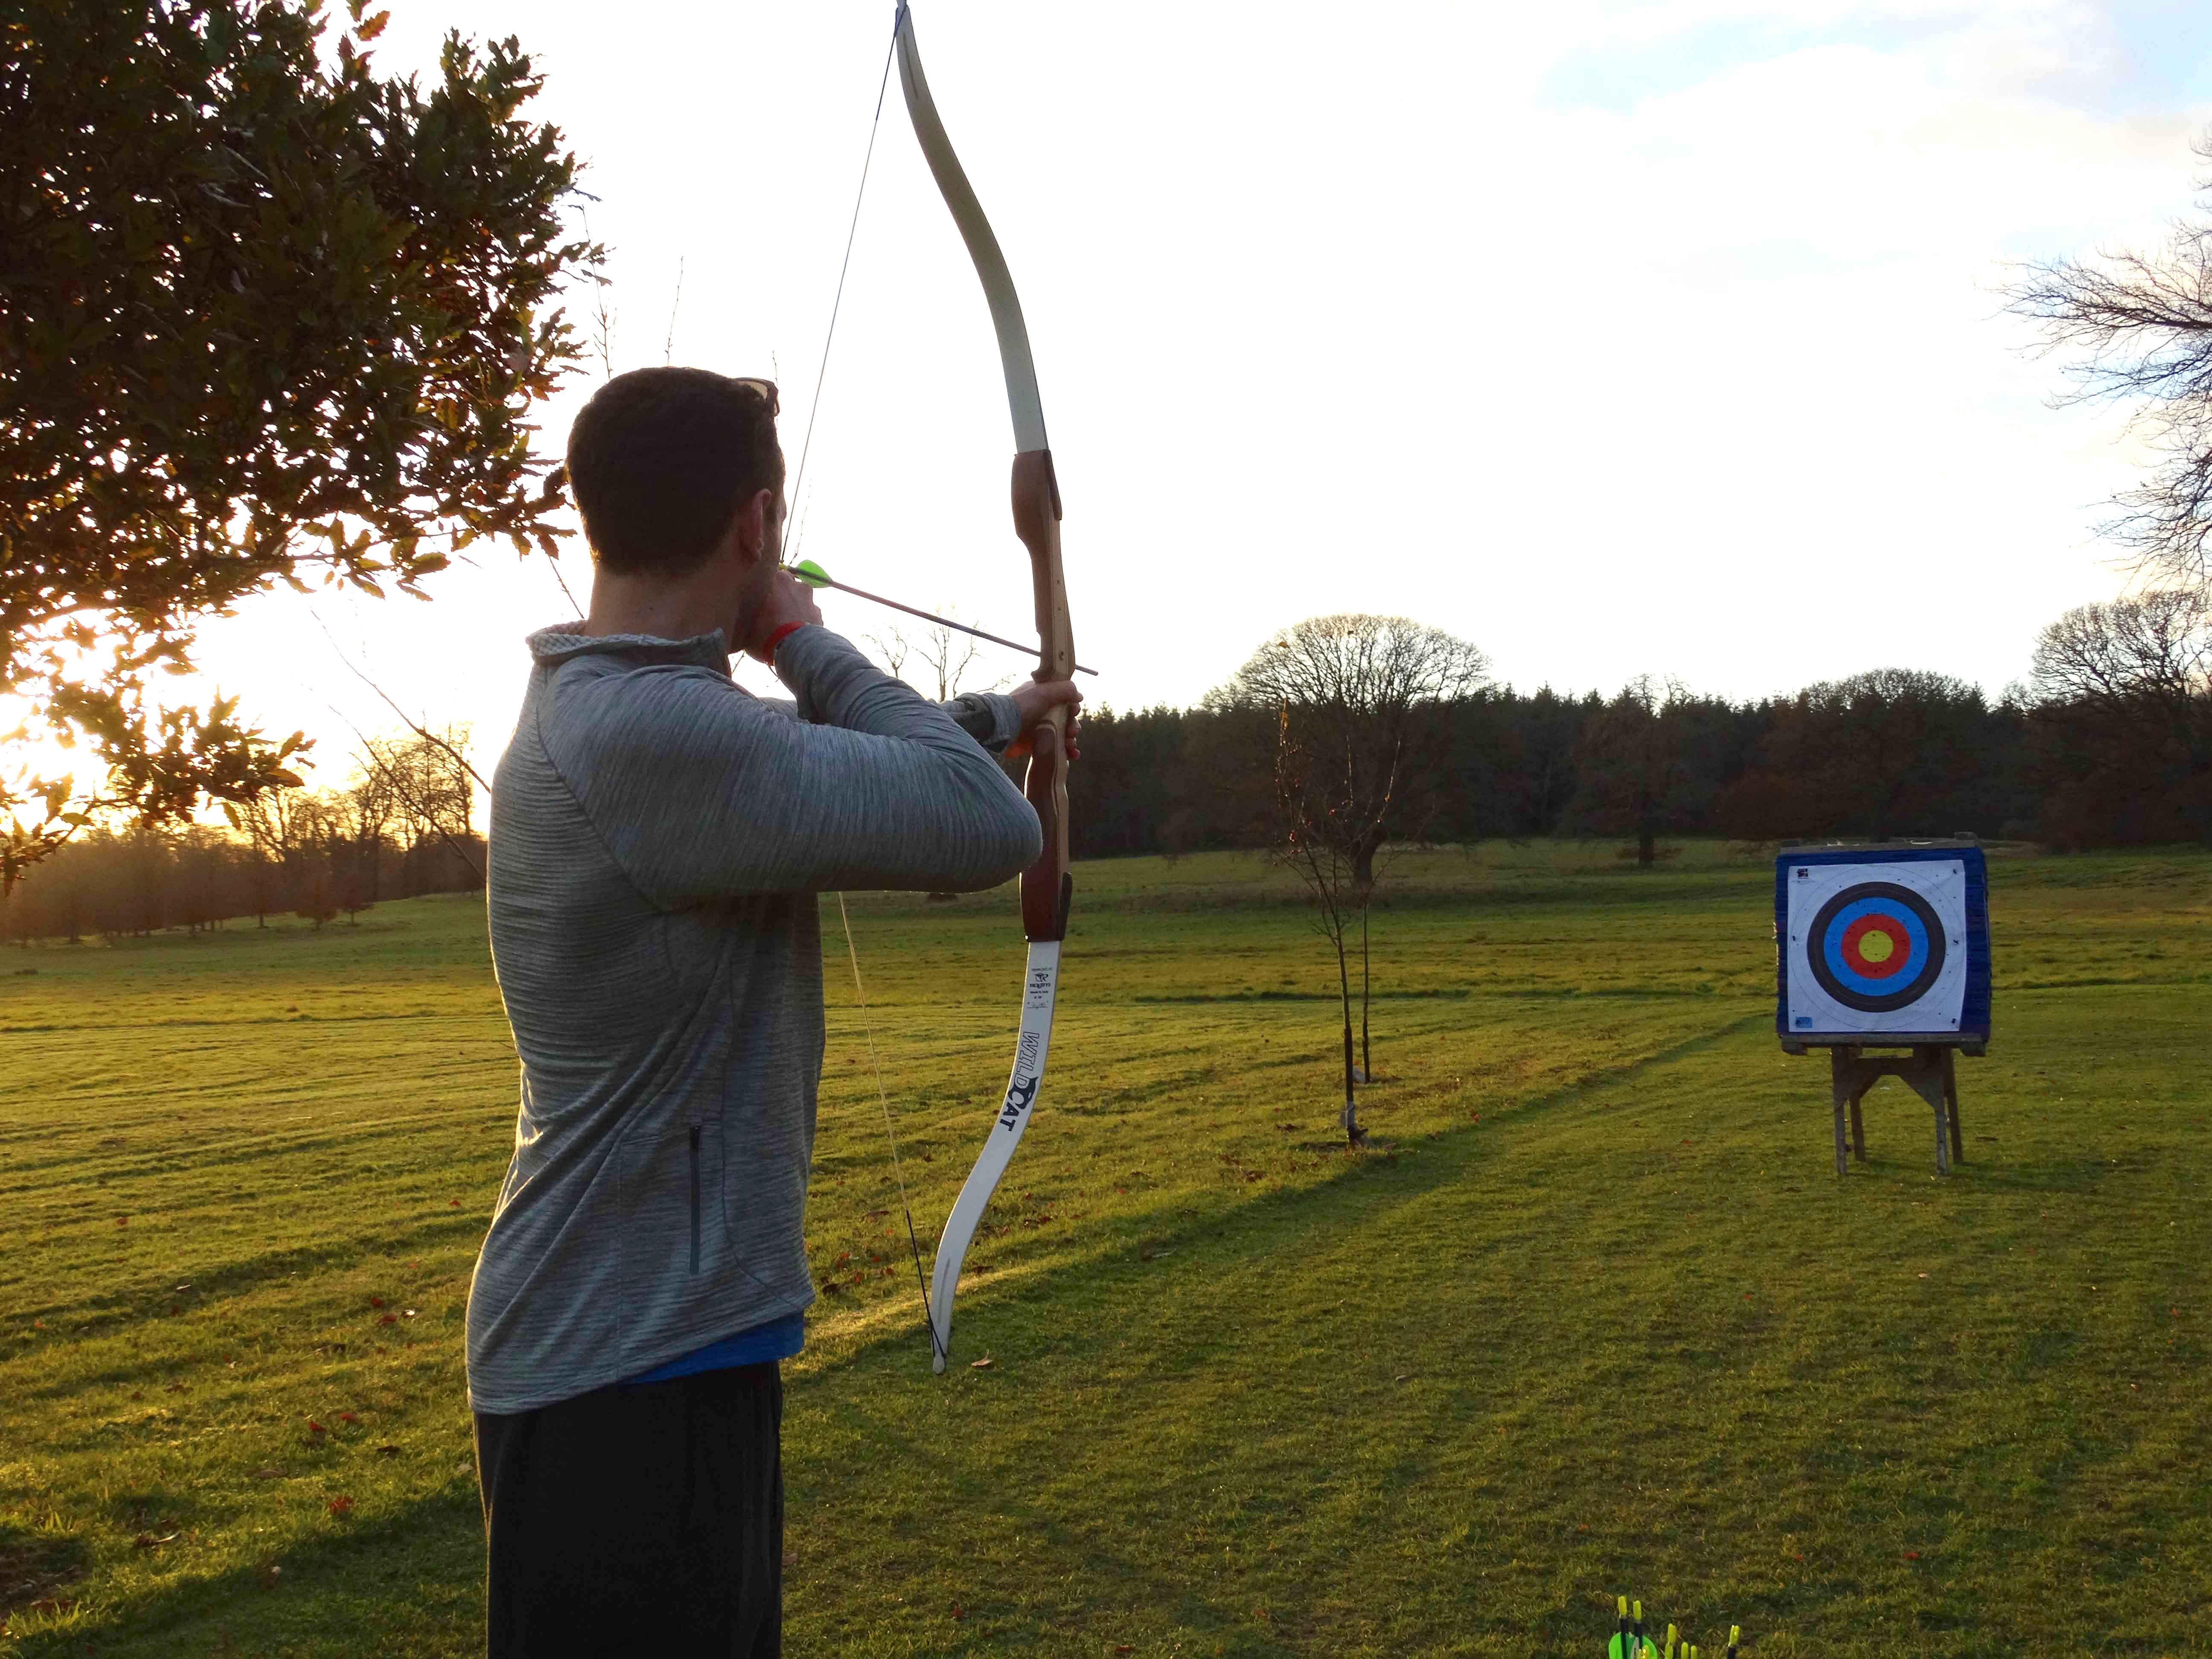 Newlywed groom partaking in archery at Ballyfin House in Ireland